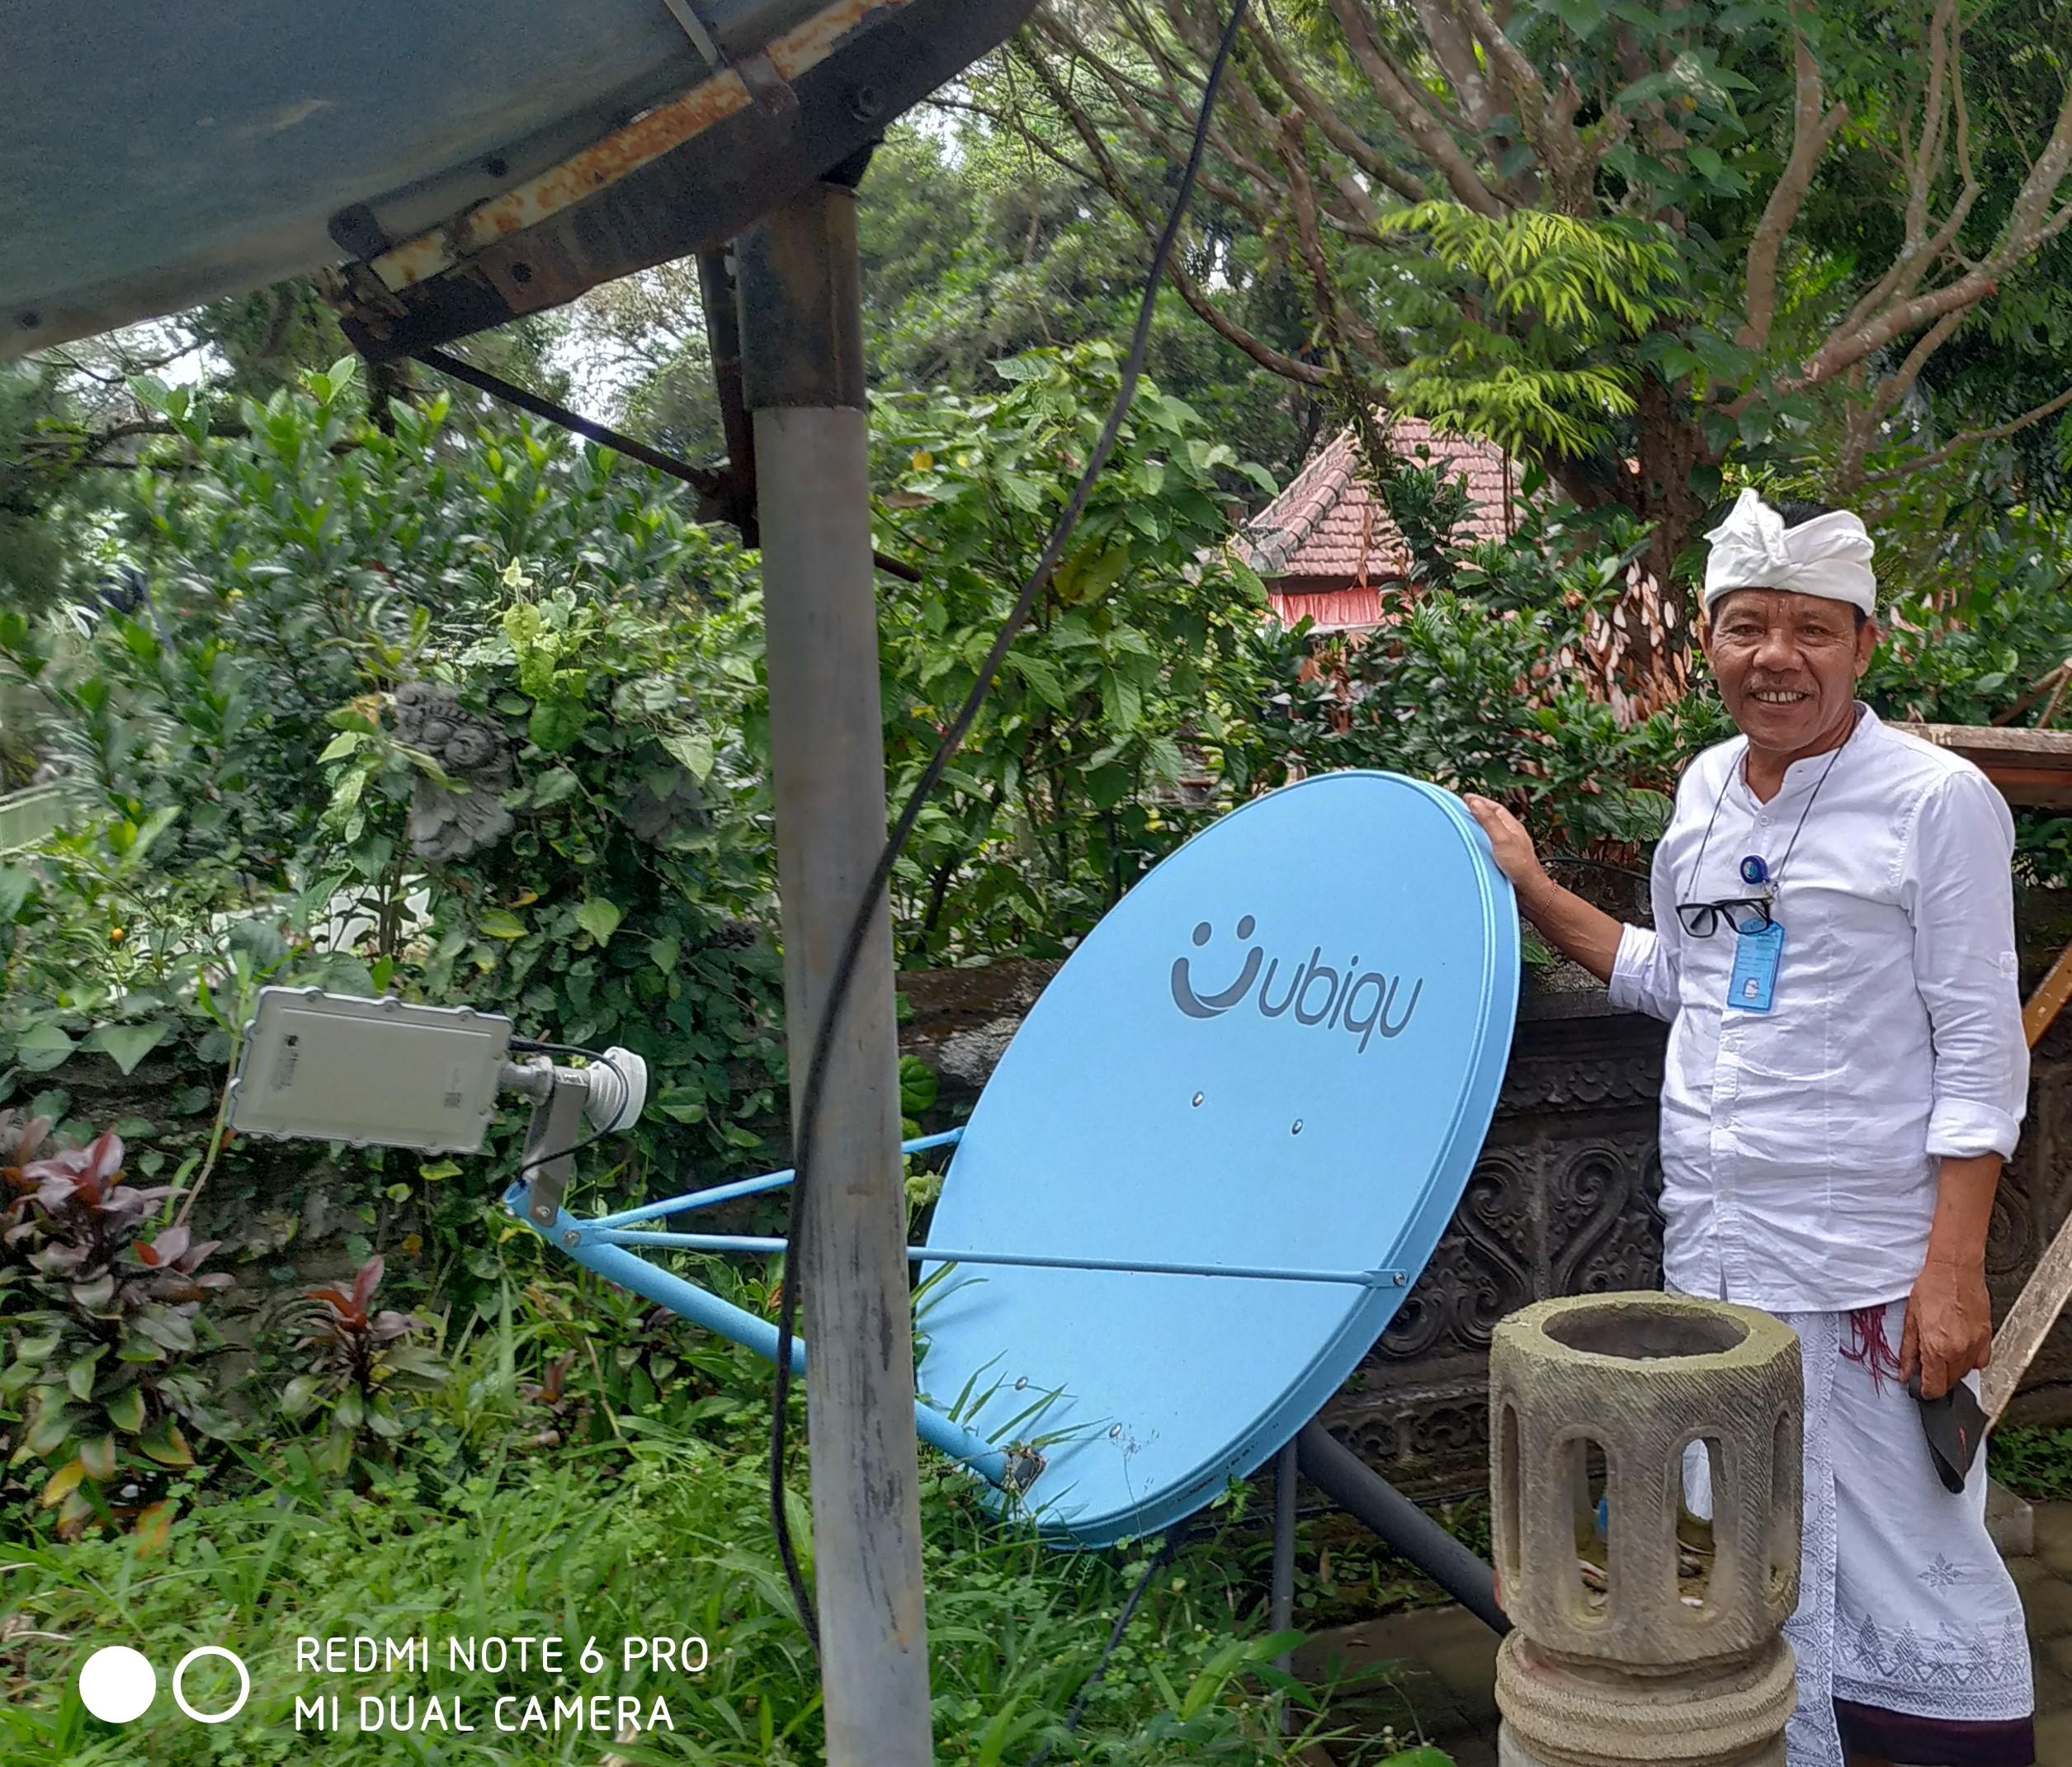 Foto: WRS GENERASI TERBARU KEPALA Pelaksana BPBD Bangli, I Wayan Gede Wiredana, menunjukkan alat WRS generasi terbaru. Foto: gia